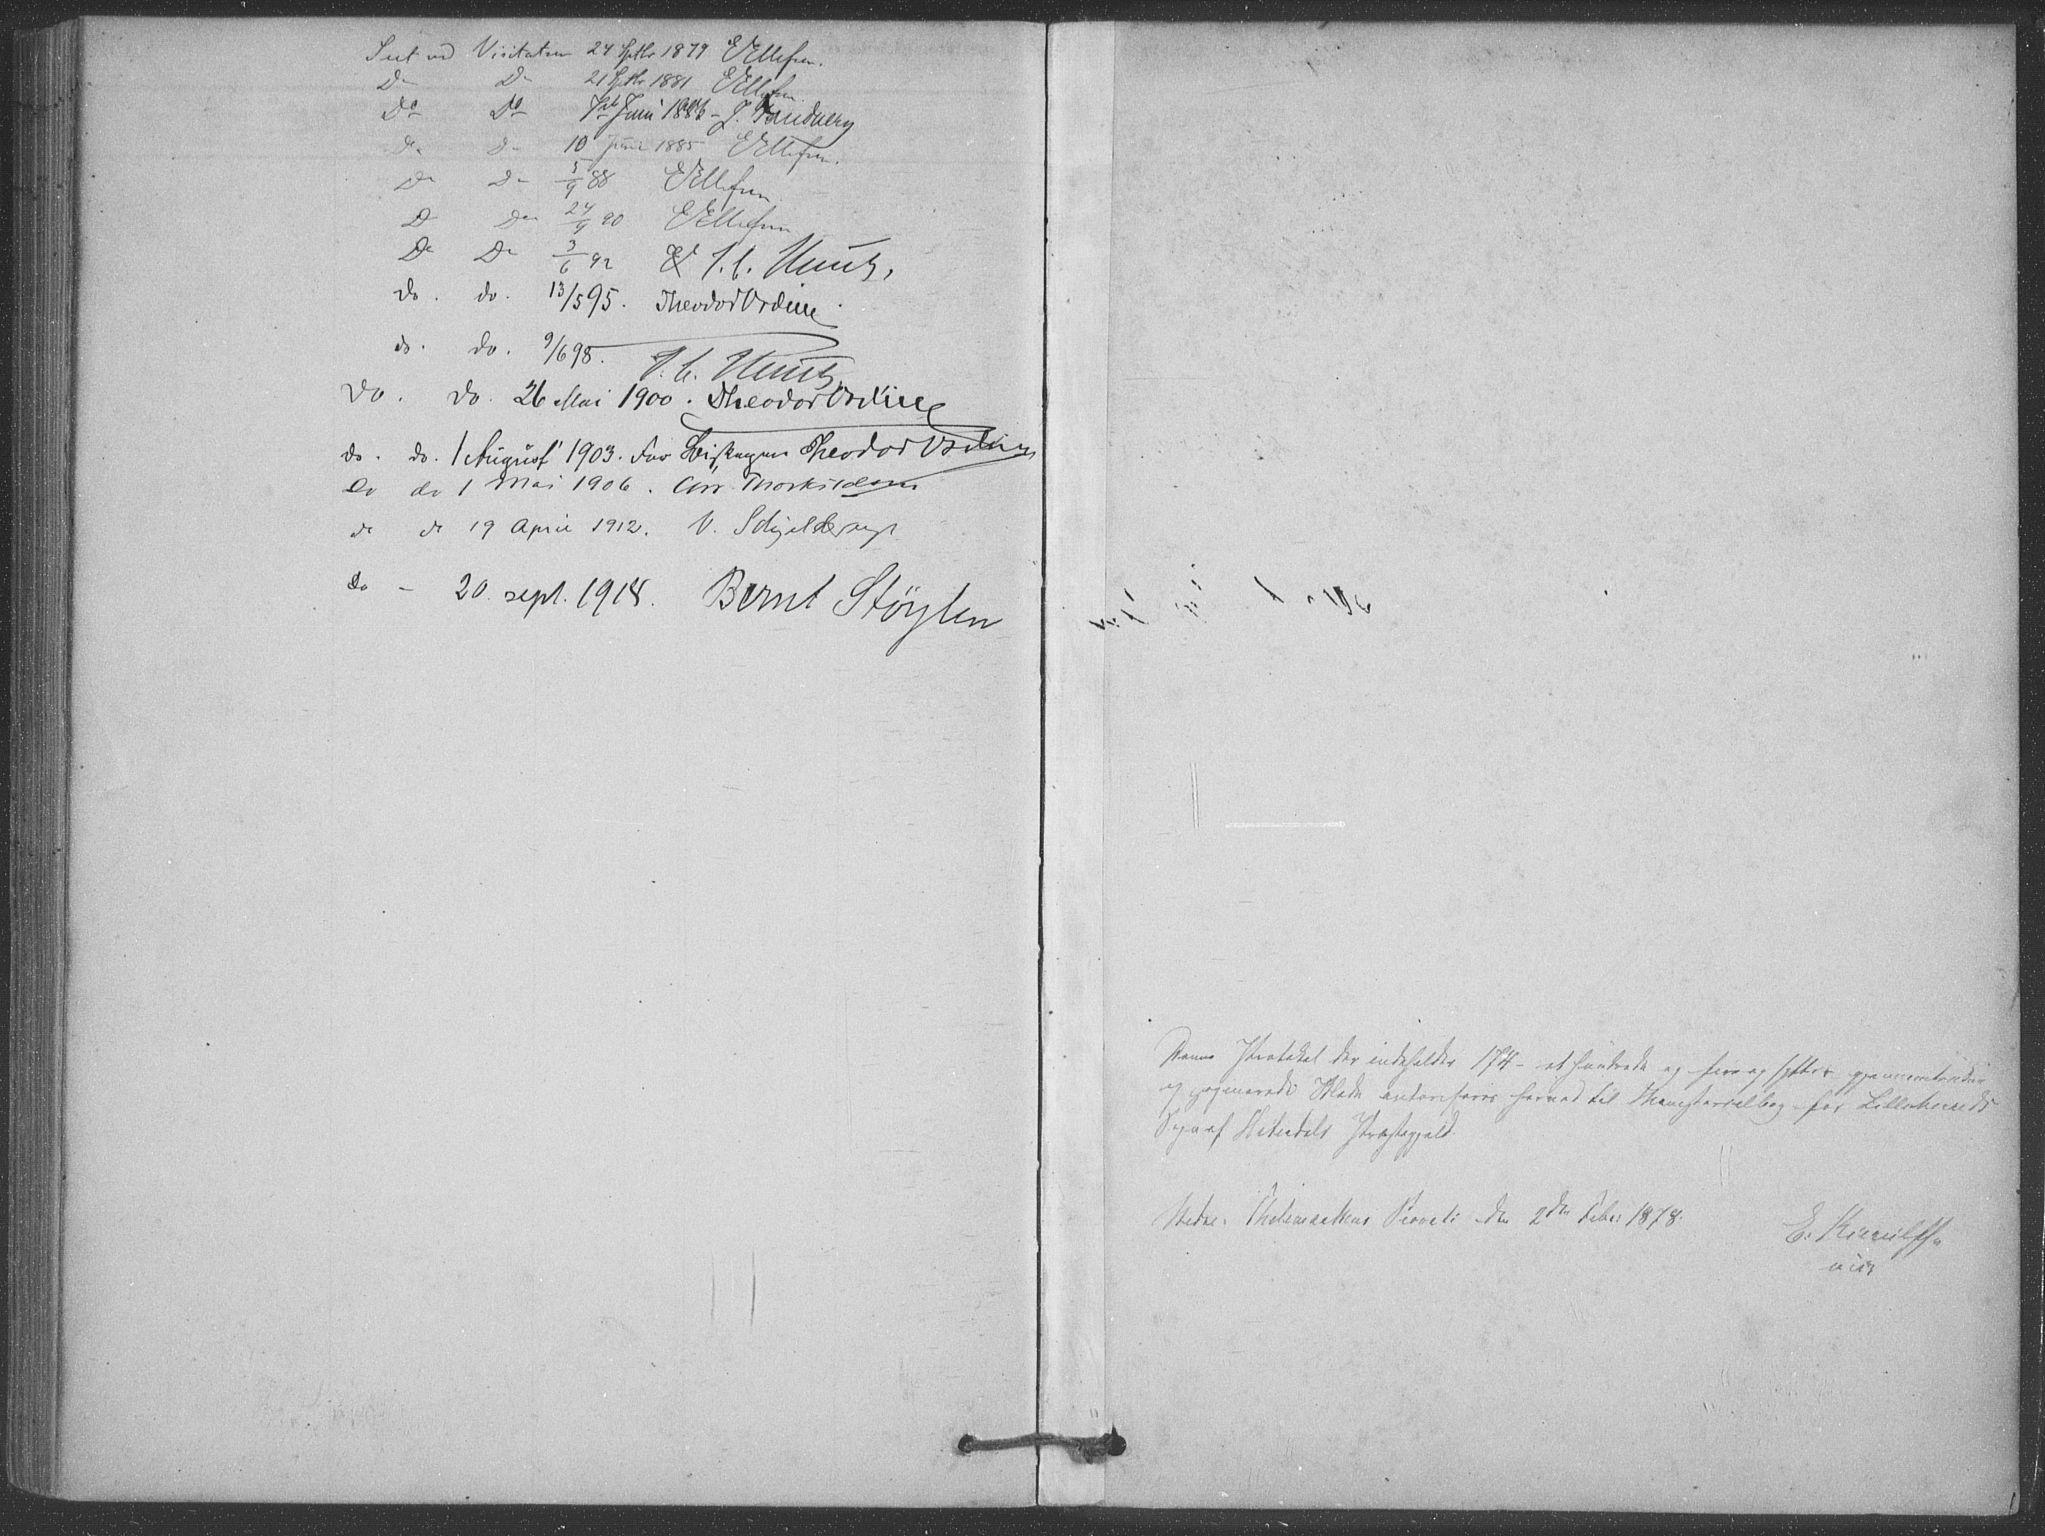 SAKO, Heddal kirkebøker, F/Fb/L0002: Ministerialbok nr. II 2, 1878-1913